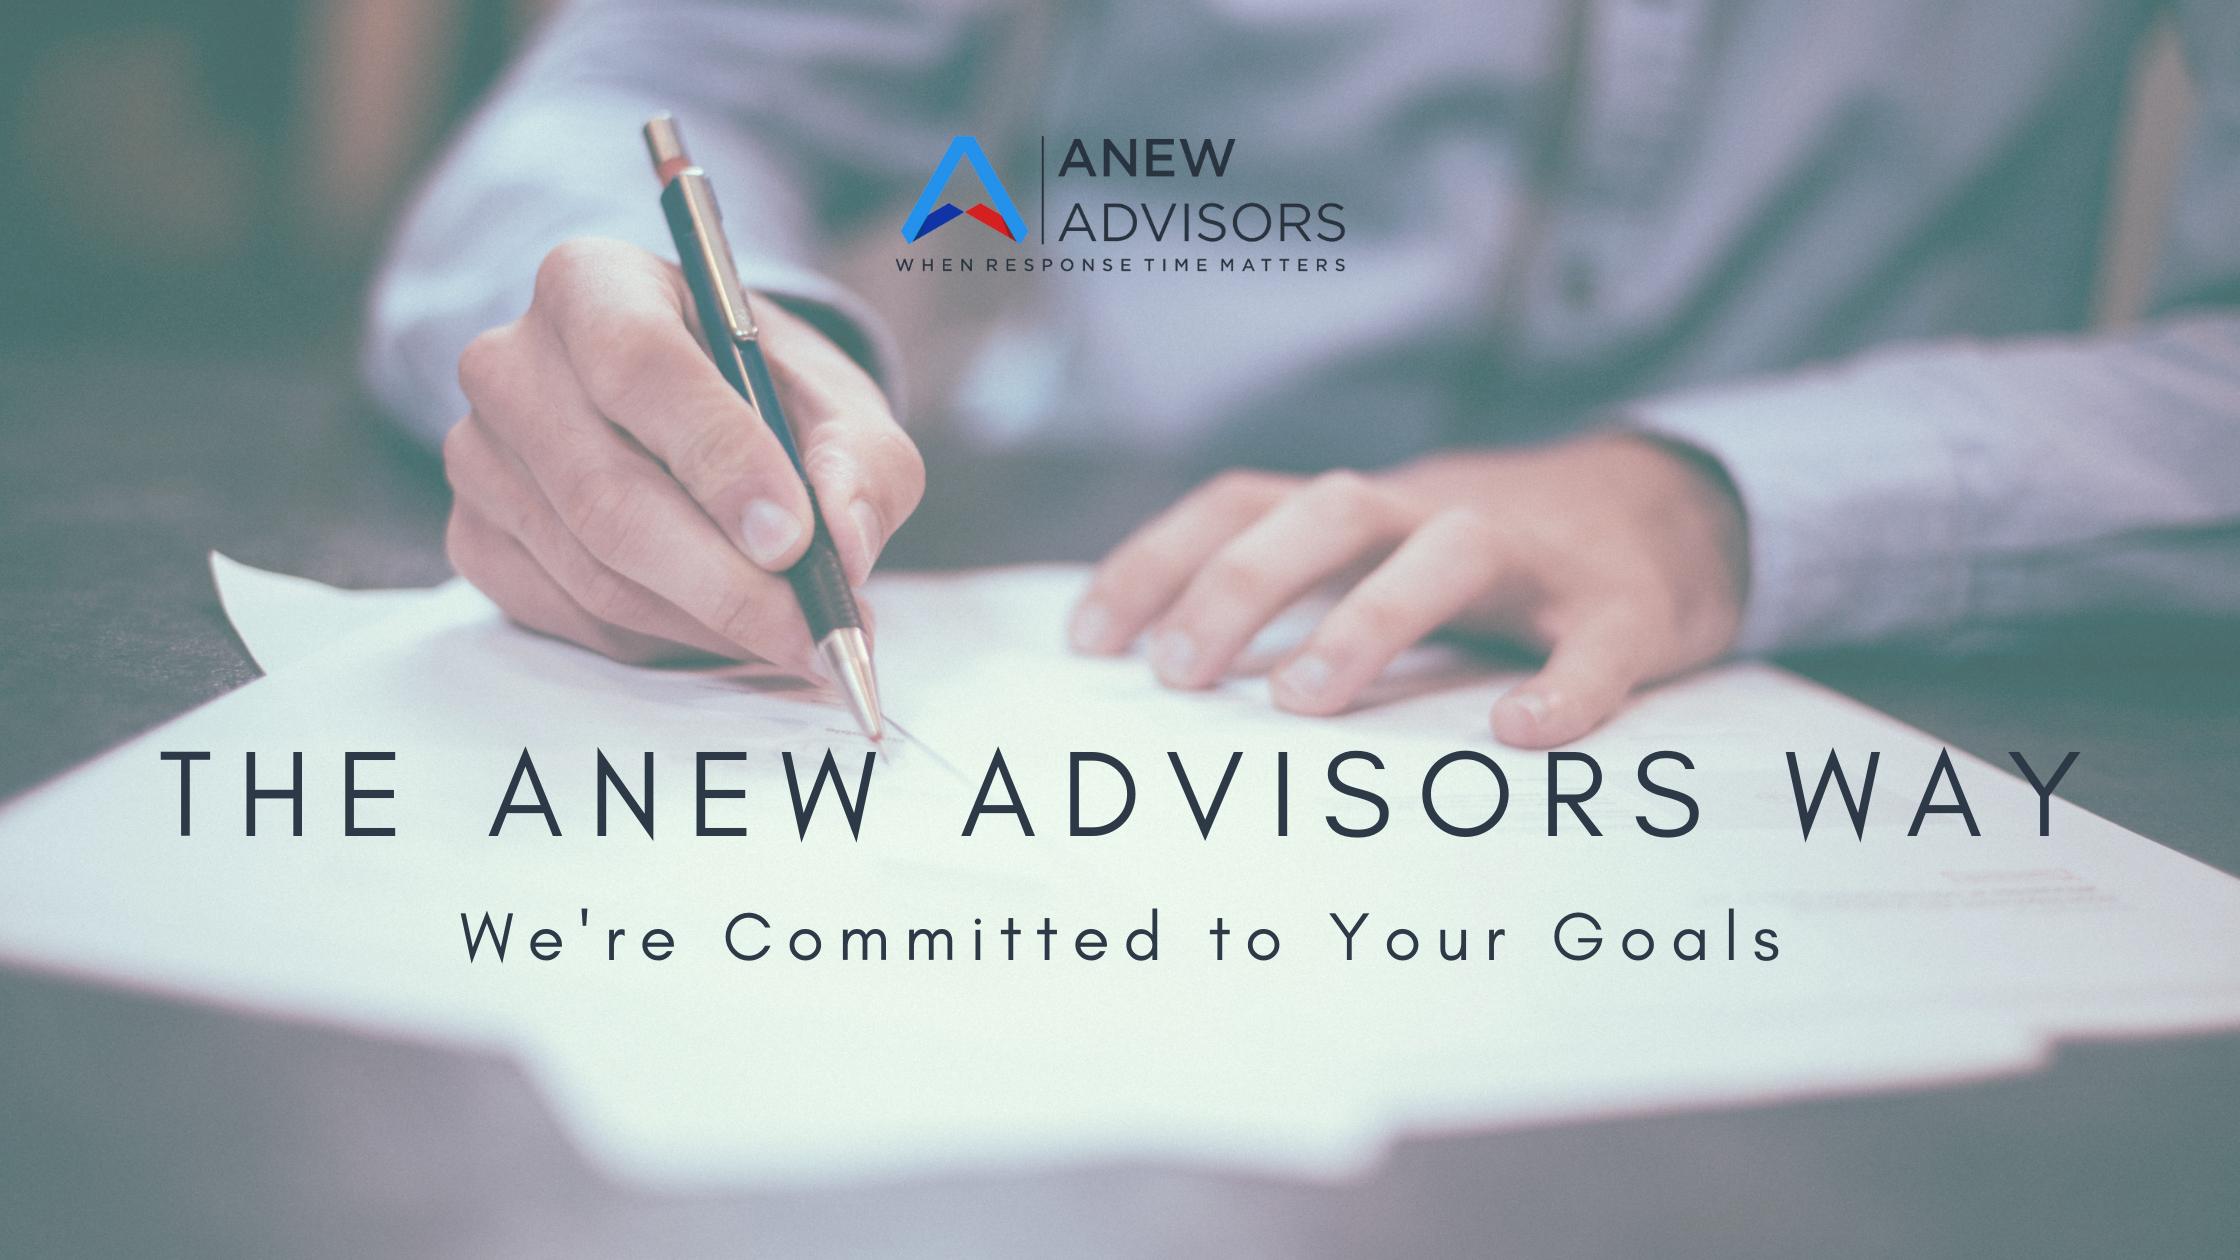 the anew advisors way